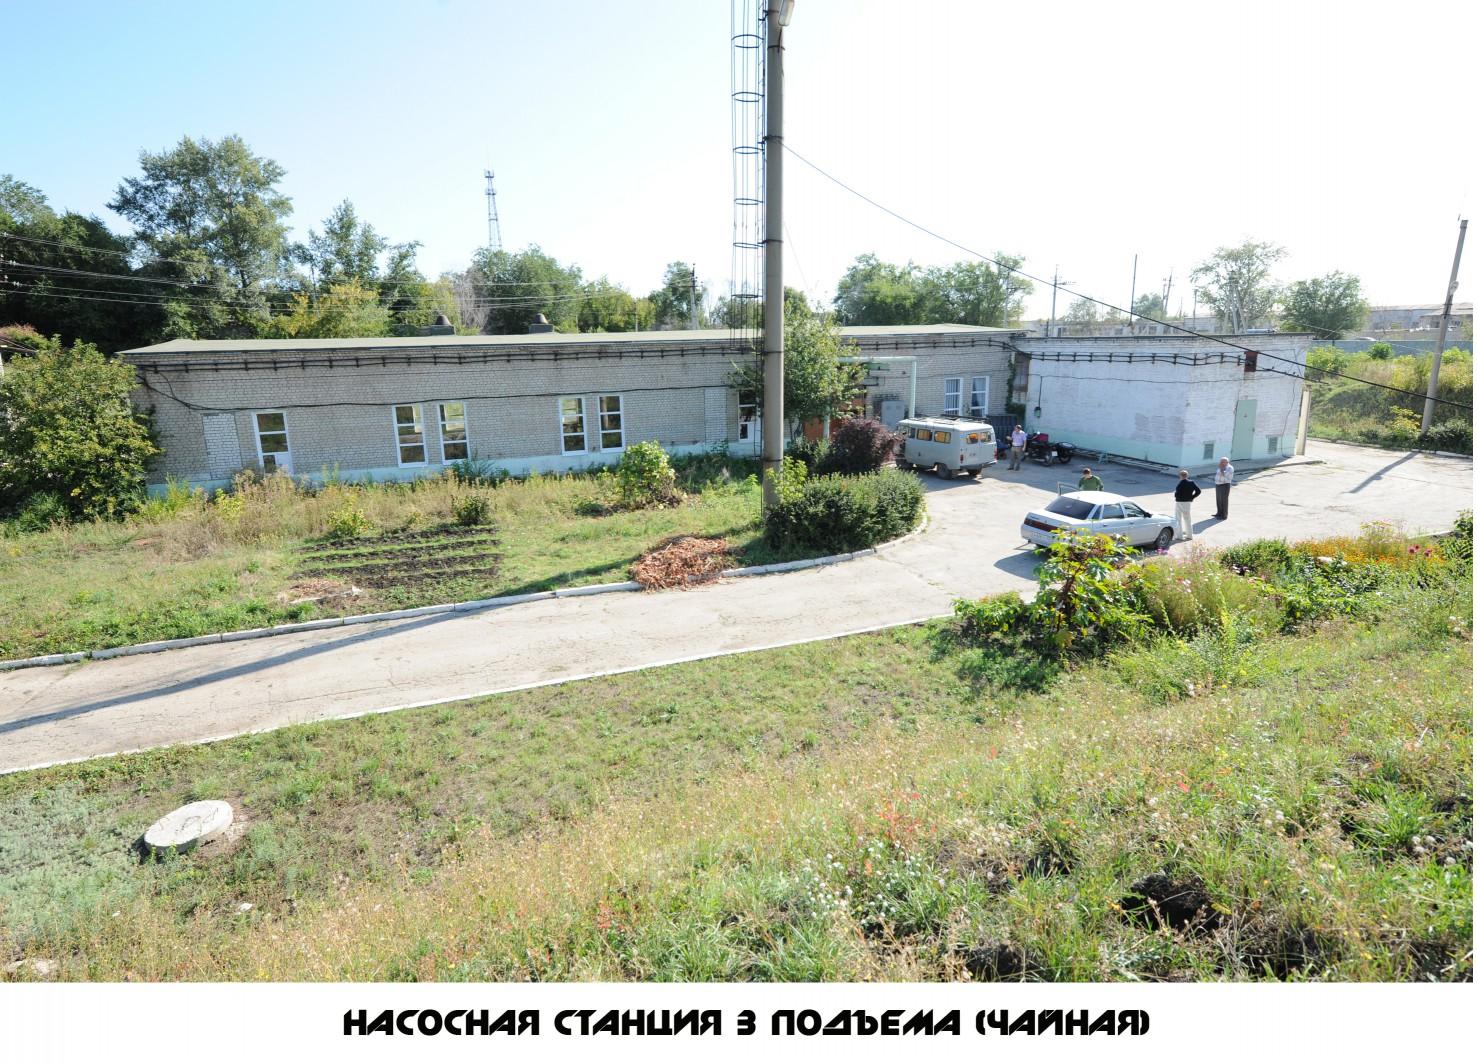 Насосная станция Чайная